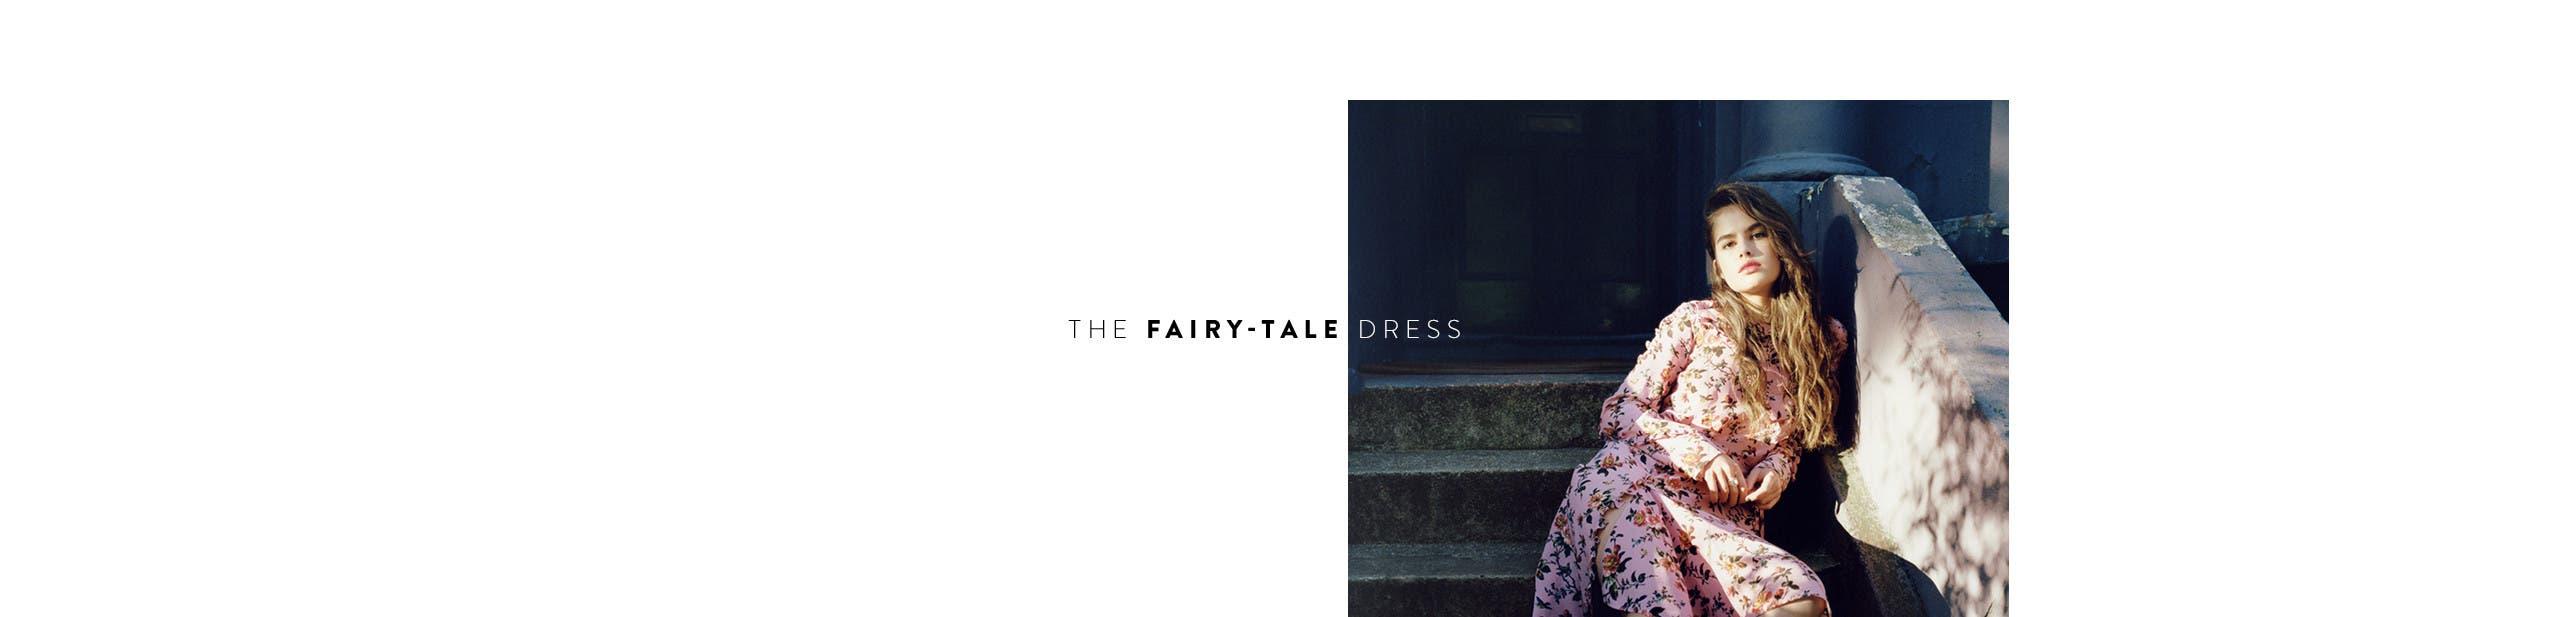 The fairy-tale dress.